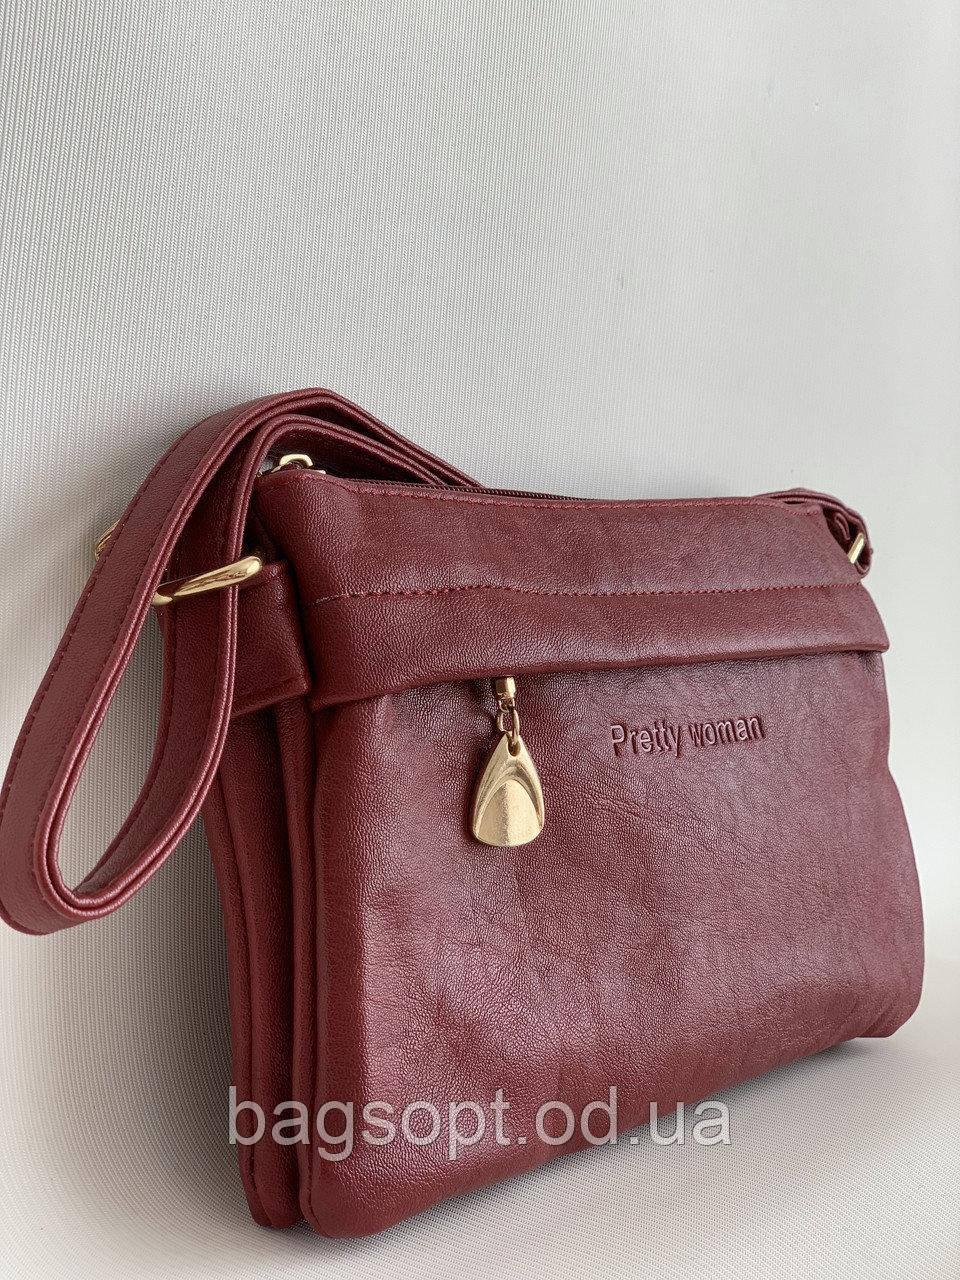 Молодежная мини сумочка клатч через плечо бордового цвета Pretty Woman Одесса 7 км